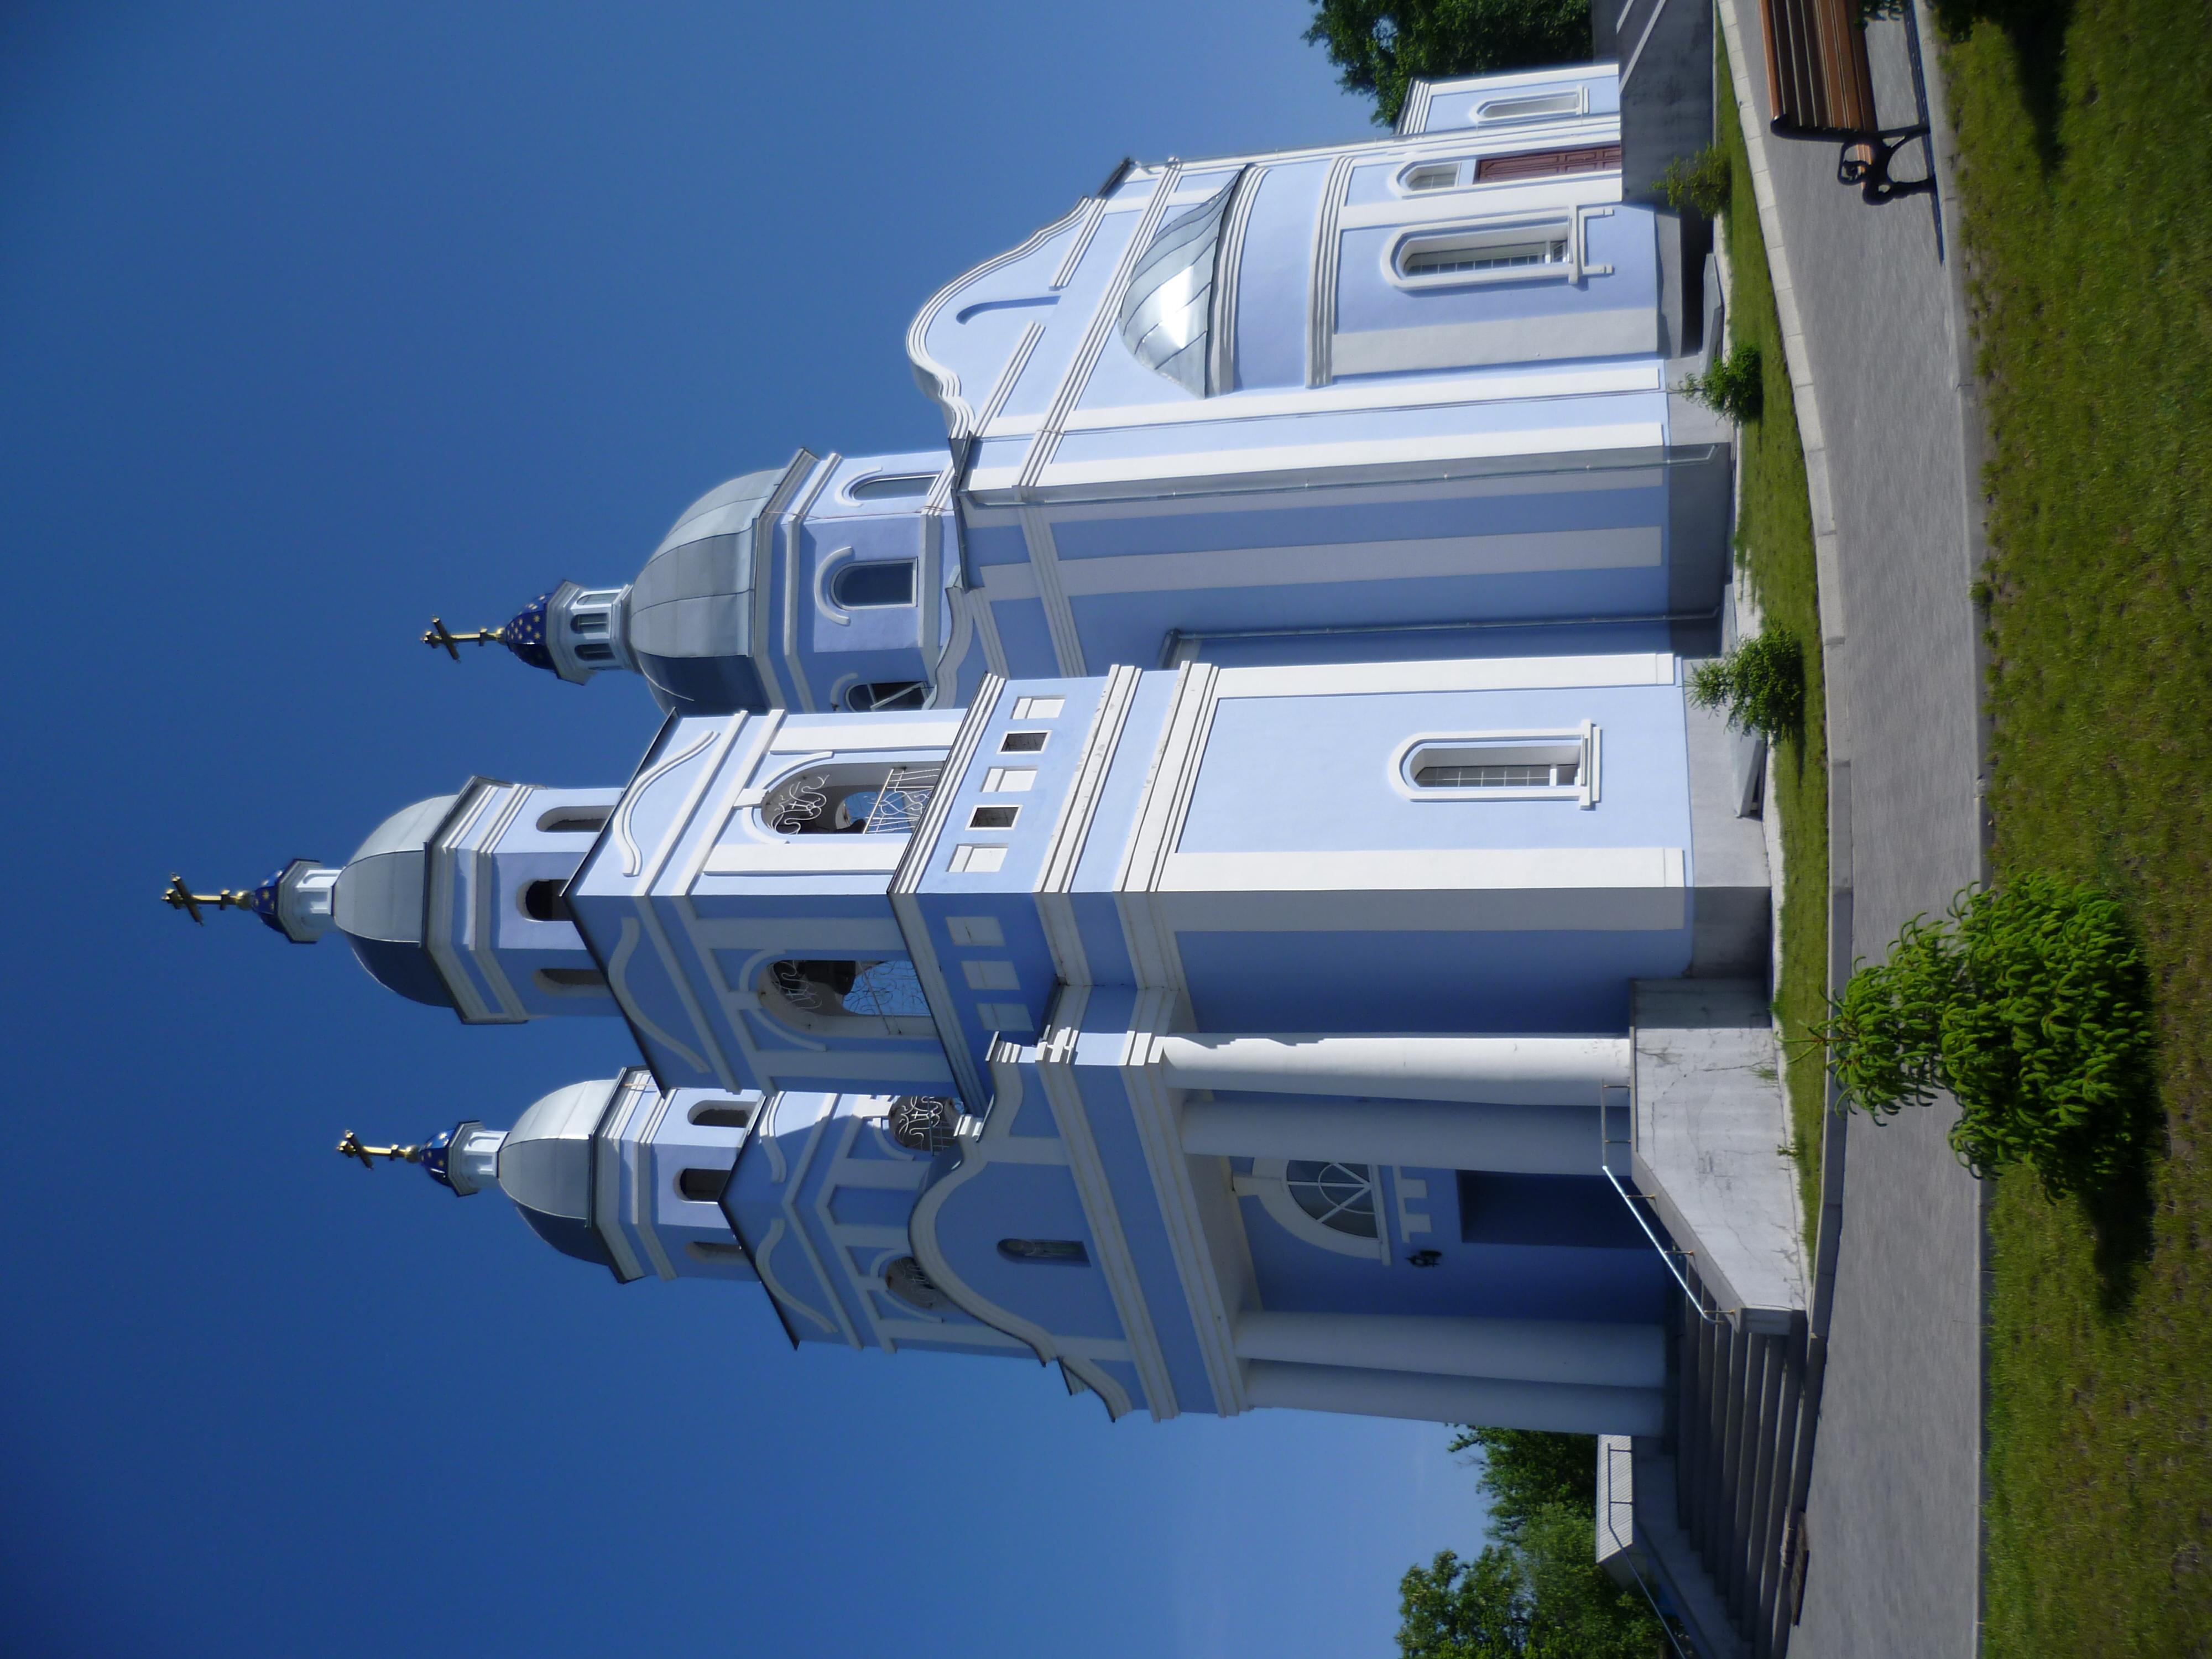 http   www.3dnews.ru  imgdata img 2010 06 16 593776 …imer P1000110.JPG da25c7b16a2